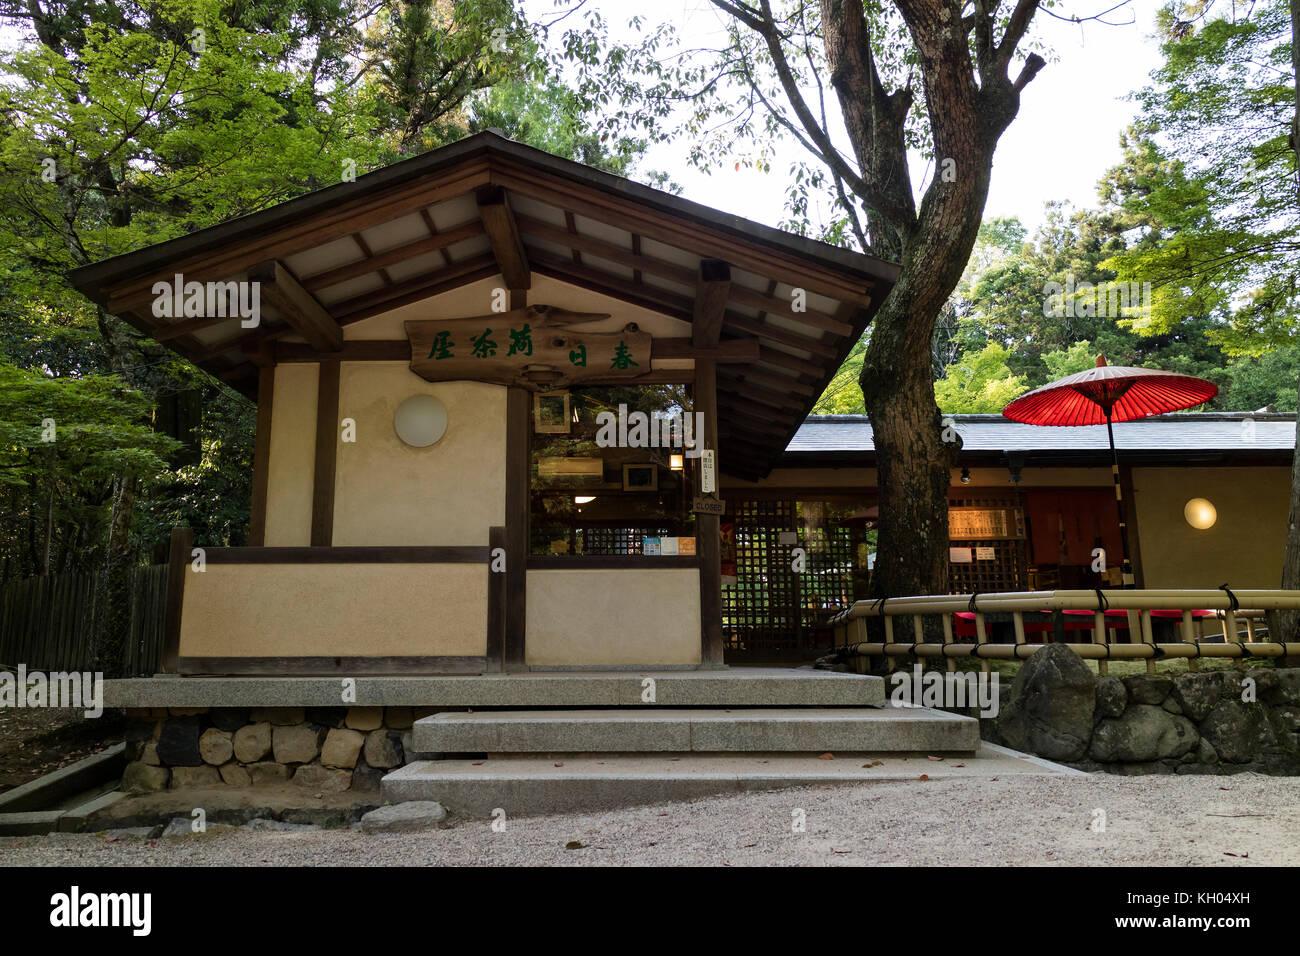 Nara - Japan, May 29, 2017: Traditional built Ninaijaya tea room on the way to the Kasuga Taisha shrine - Stock Image